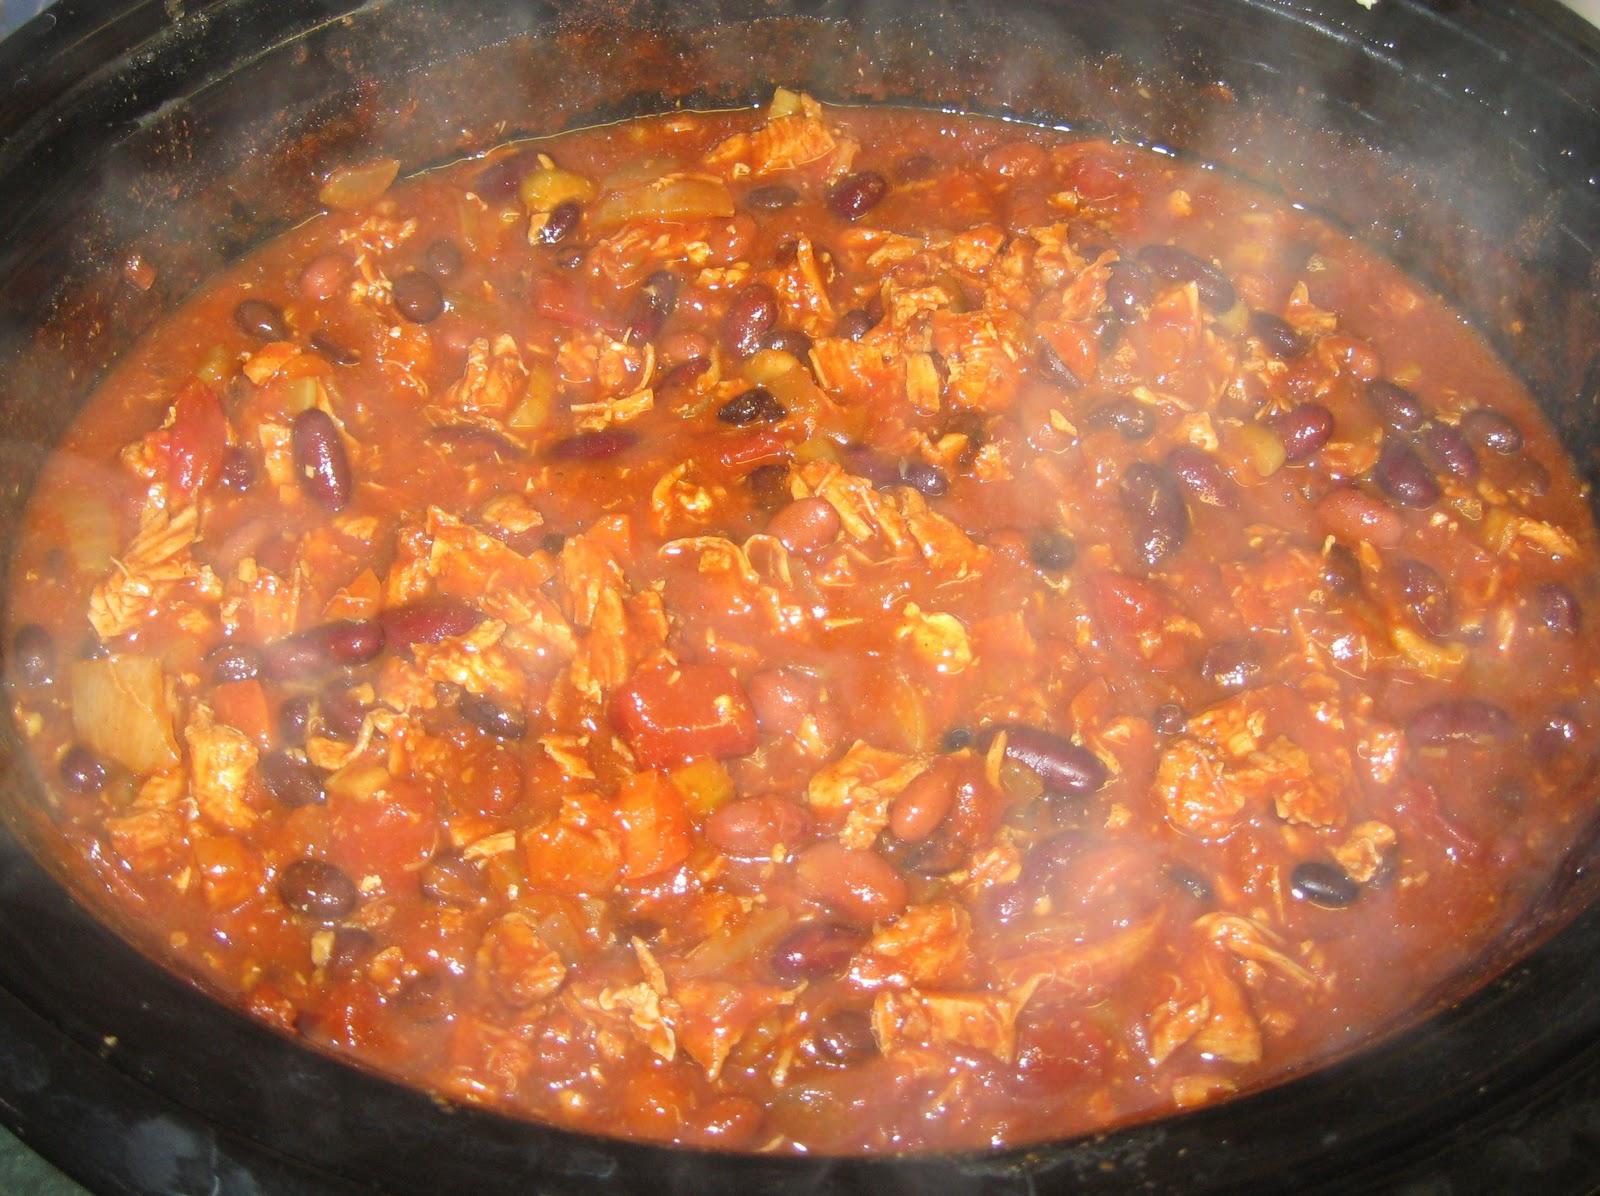 Shredded chicken chili recipe slow cooker